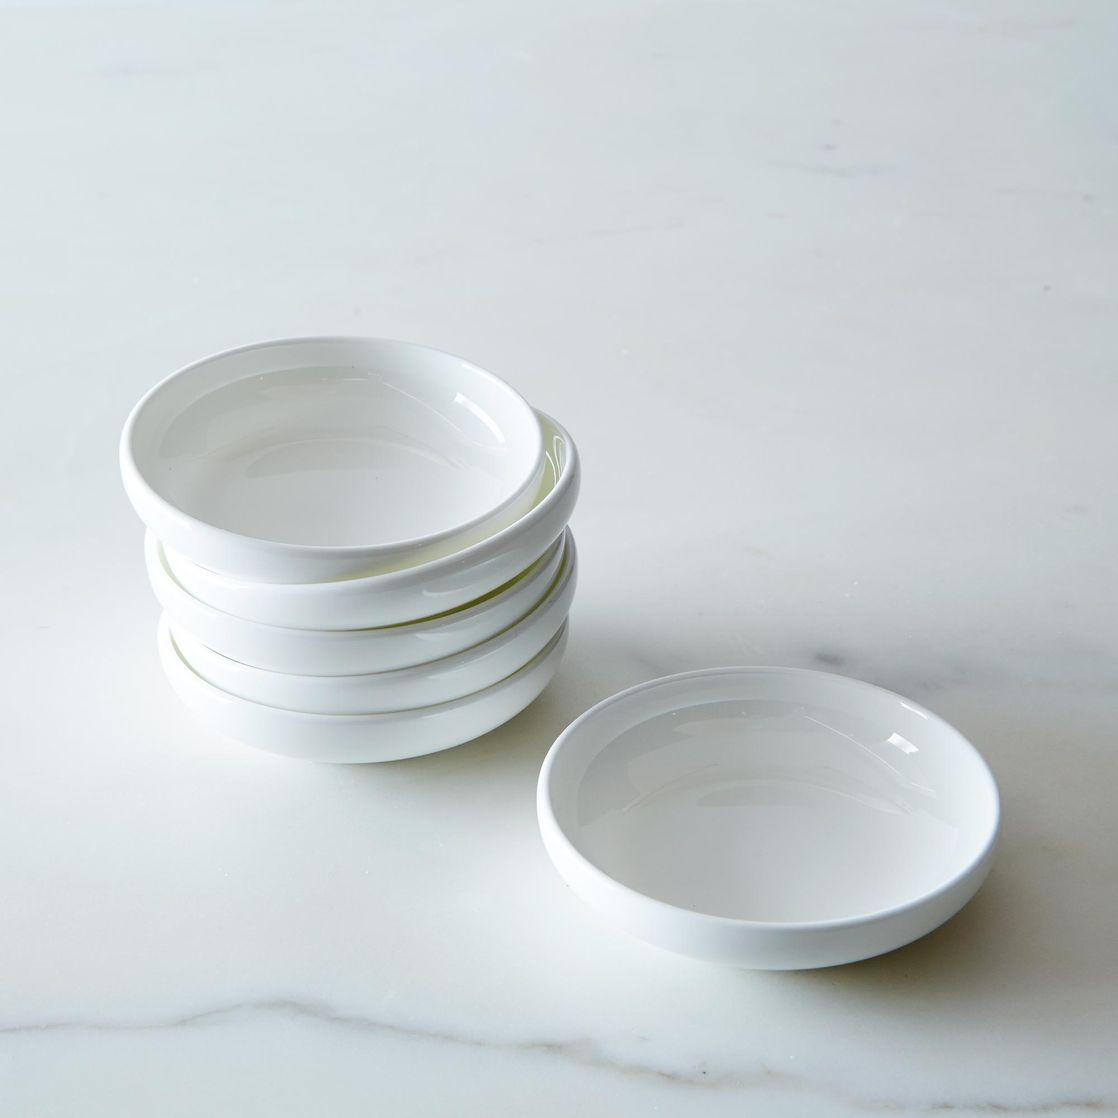 White-Condiment-Bowls.jpg